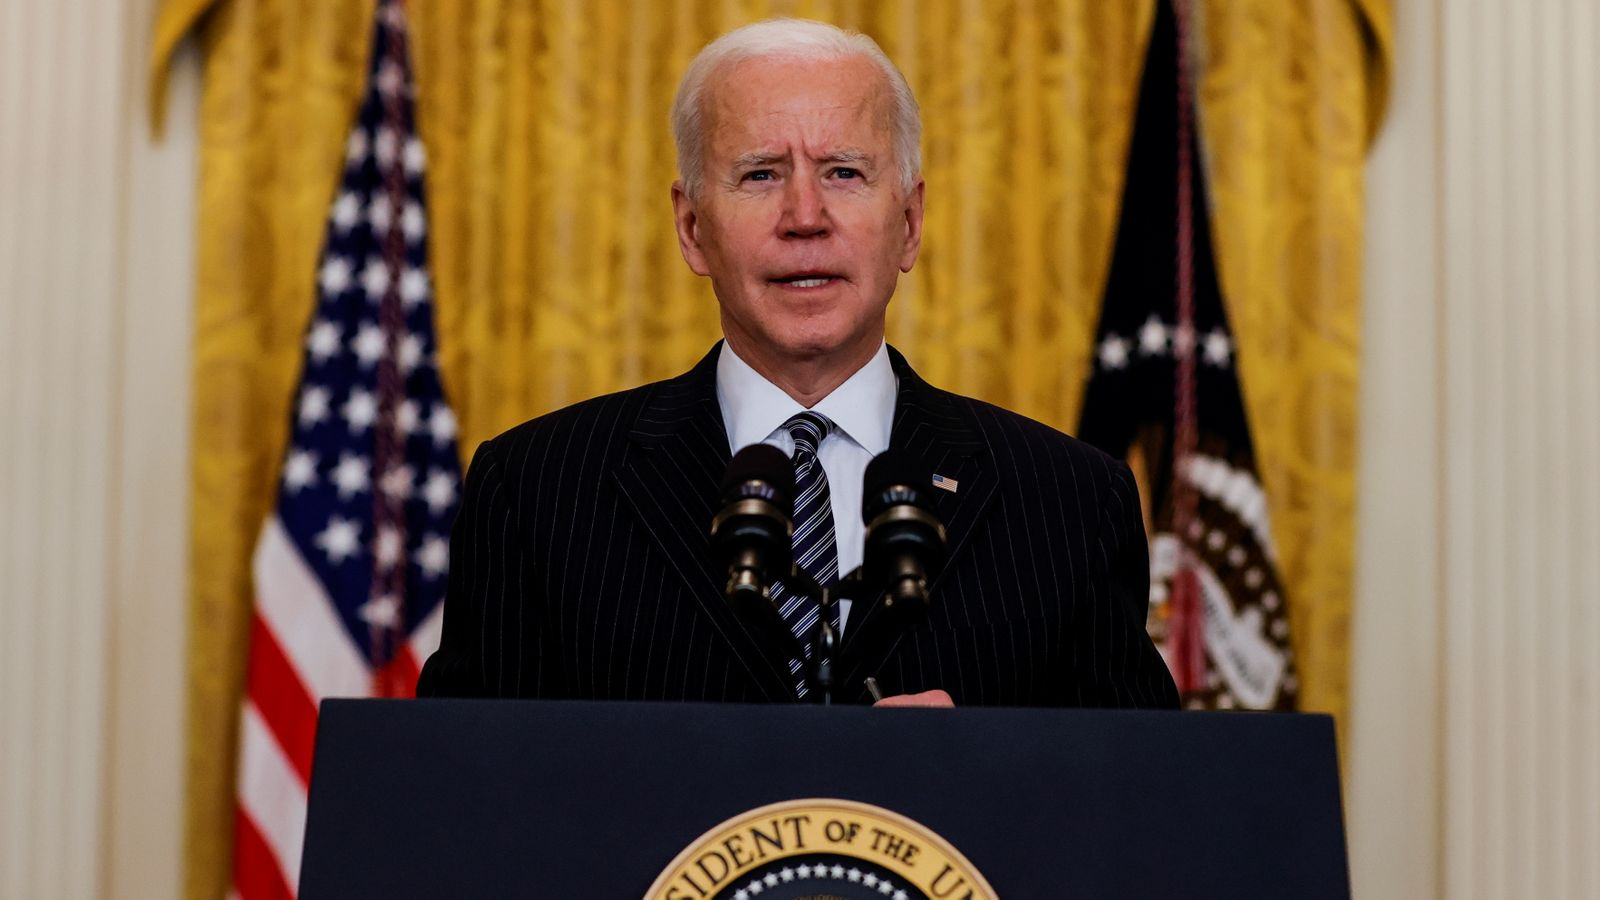 Biden says U.S. will meet goal of 100 million COVID shots Friday — 'weeks ahead of schedule'